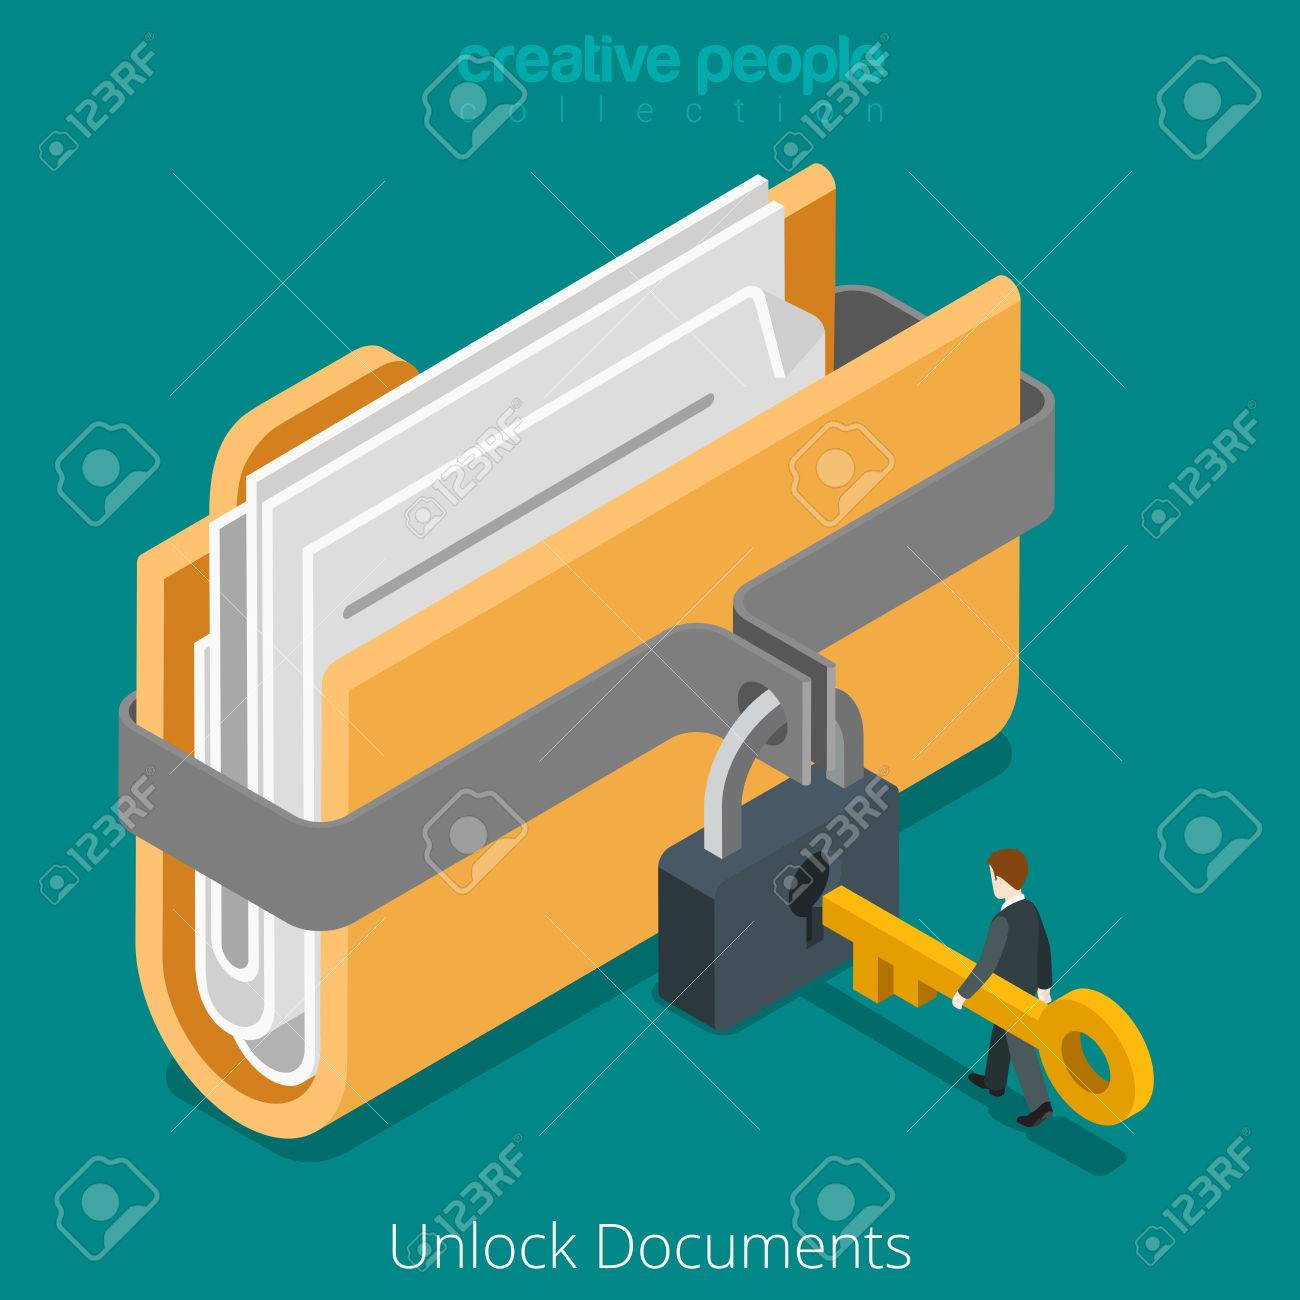 Unlock folder secure data file document with lock key icon. Flat 3d isometry isometric web vector illustration. - 56931763